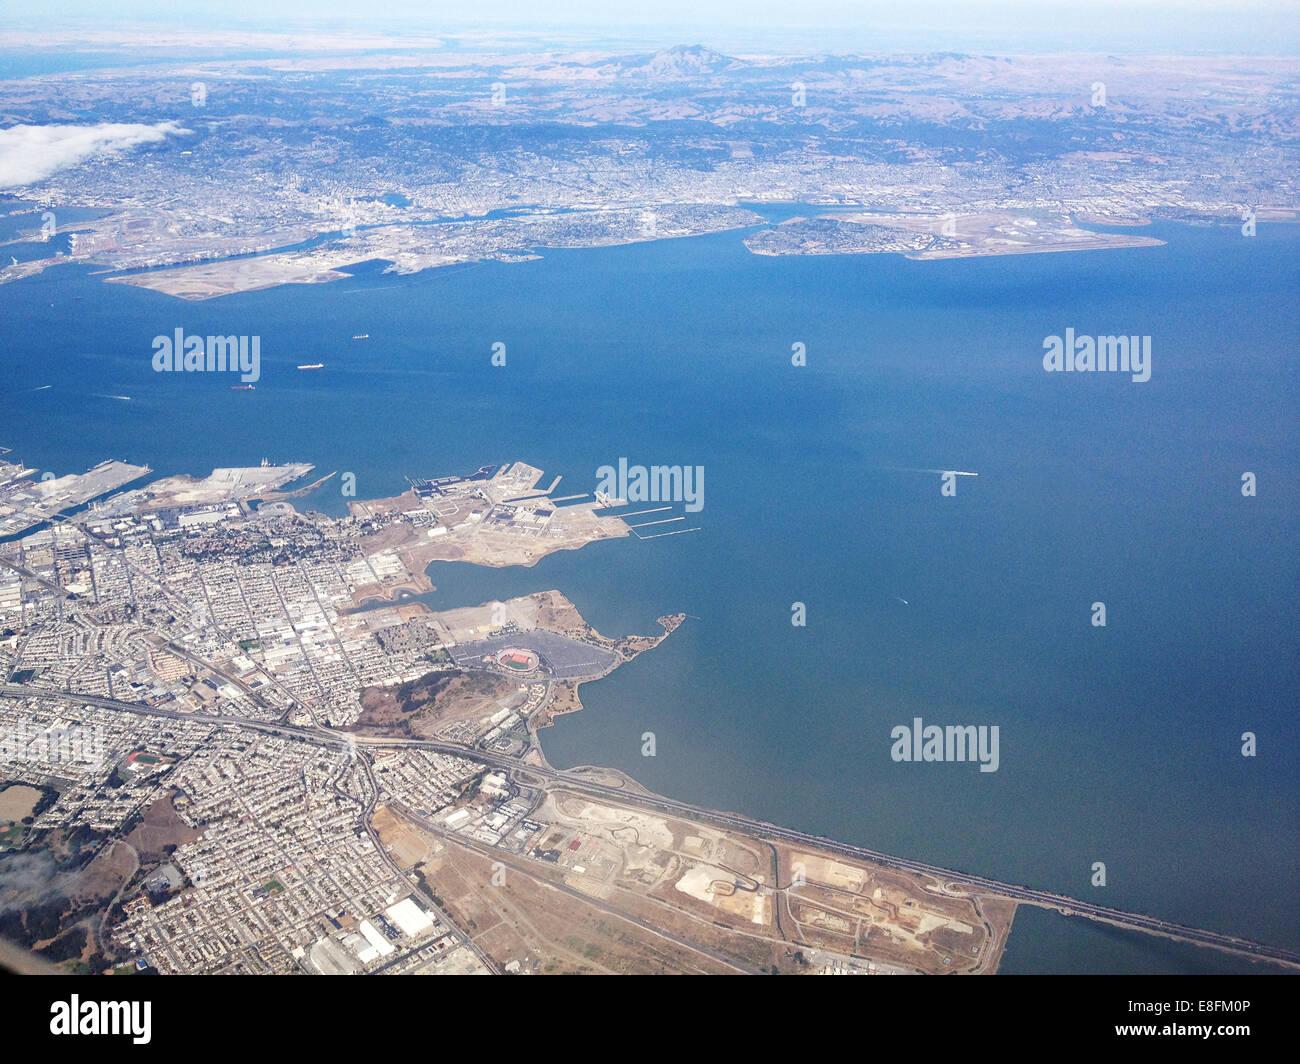 USA, California, San Francisco Bay, Alameda, Docks, Ferry Landing - Stock Image